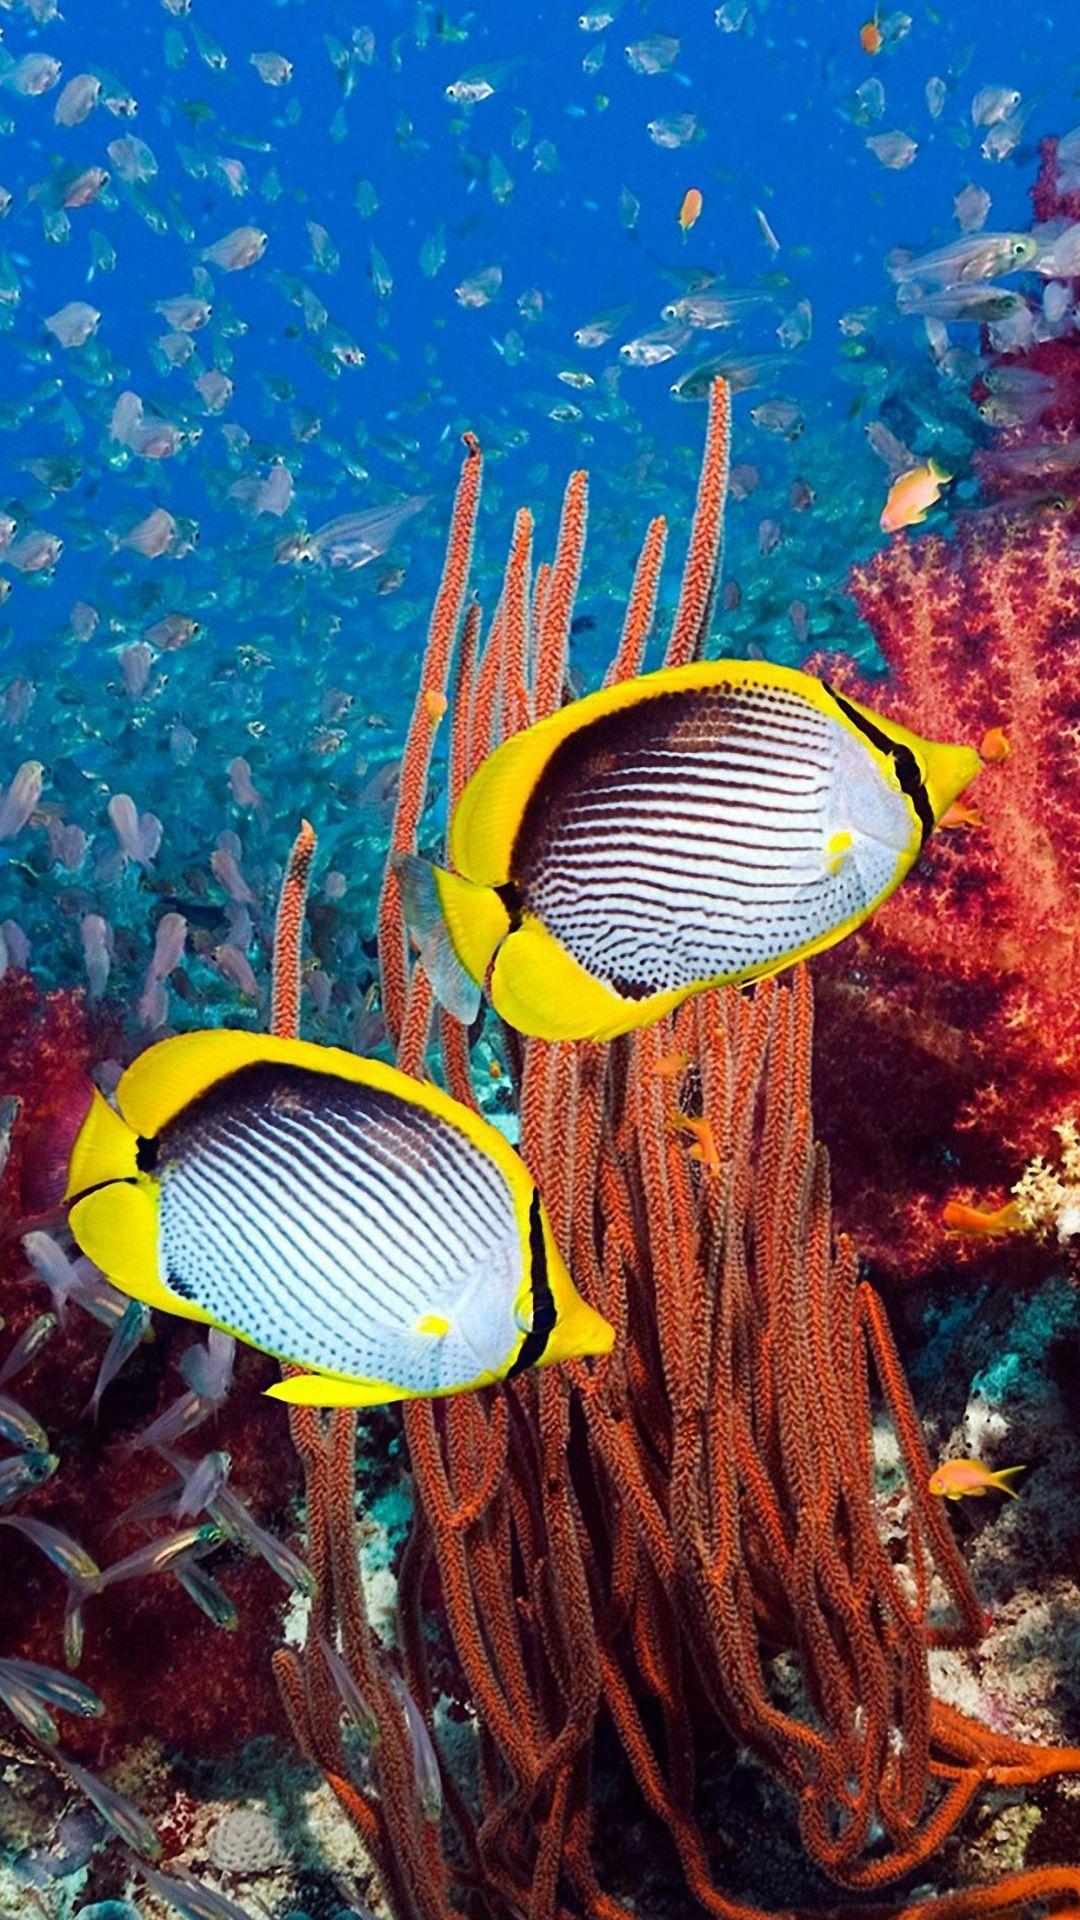 butterflyfish undersea iphone 6 wallpapers HD